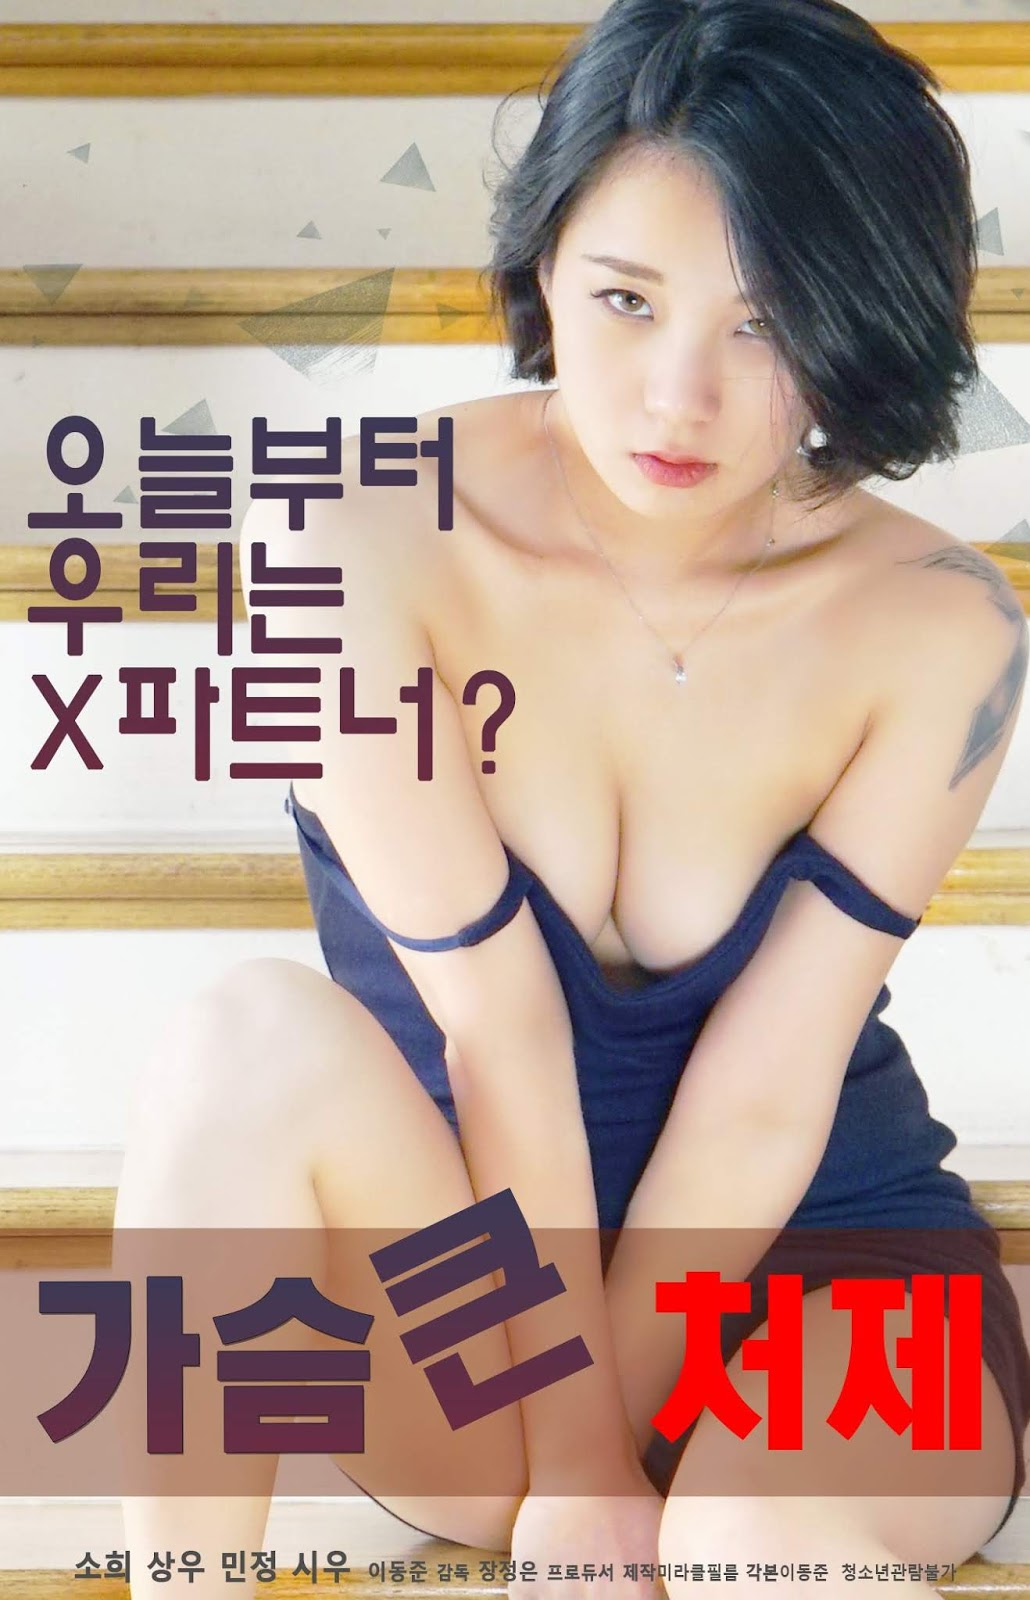 Bosomy Younger Sister In Law (2020) Full Korea 18+ Adult Movie Online Free